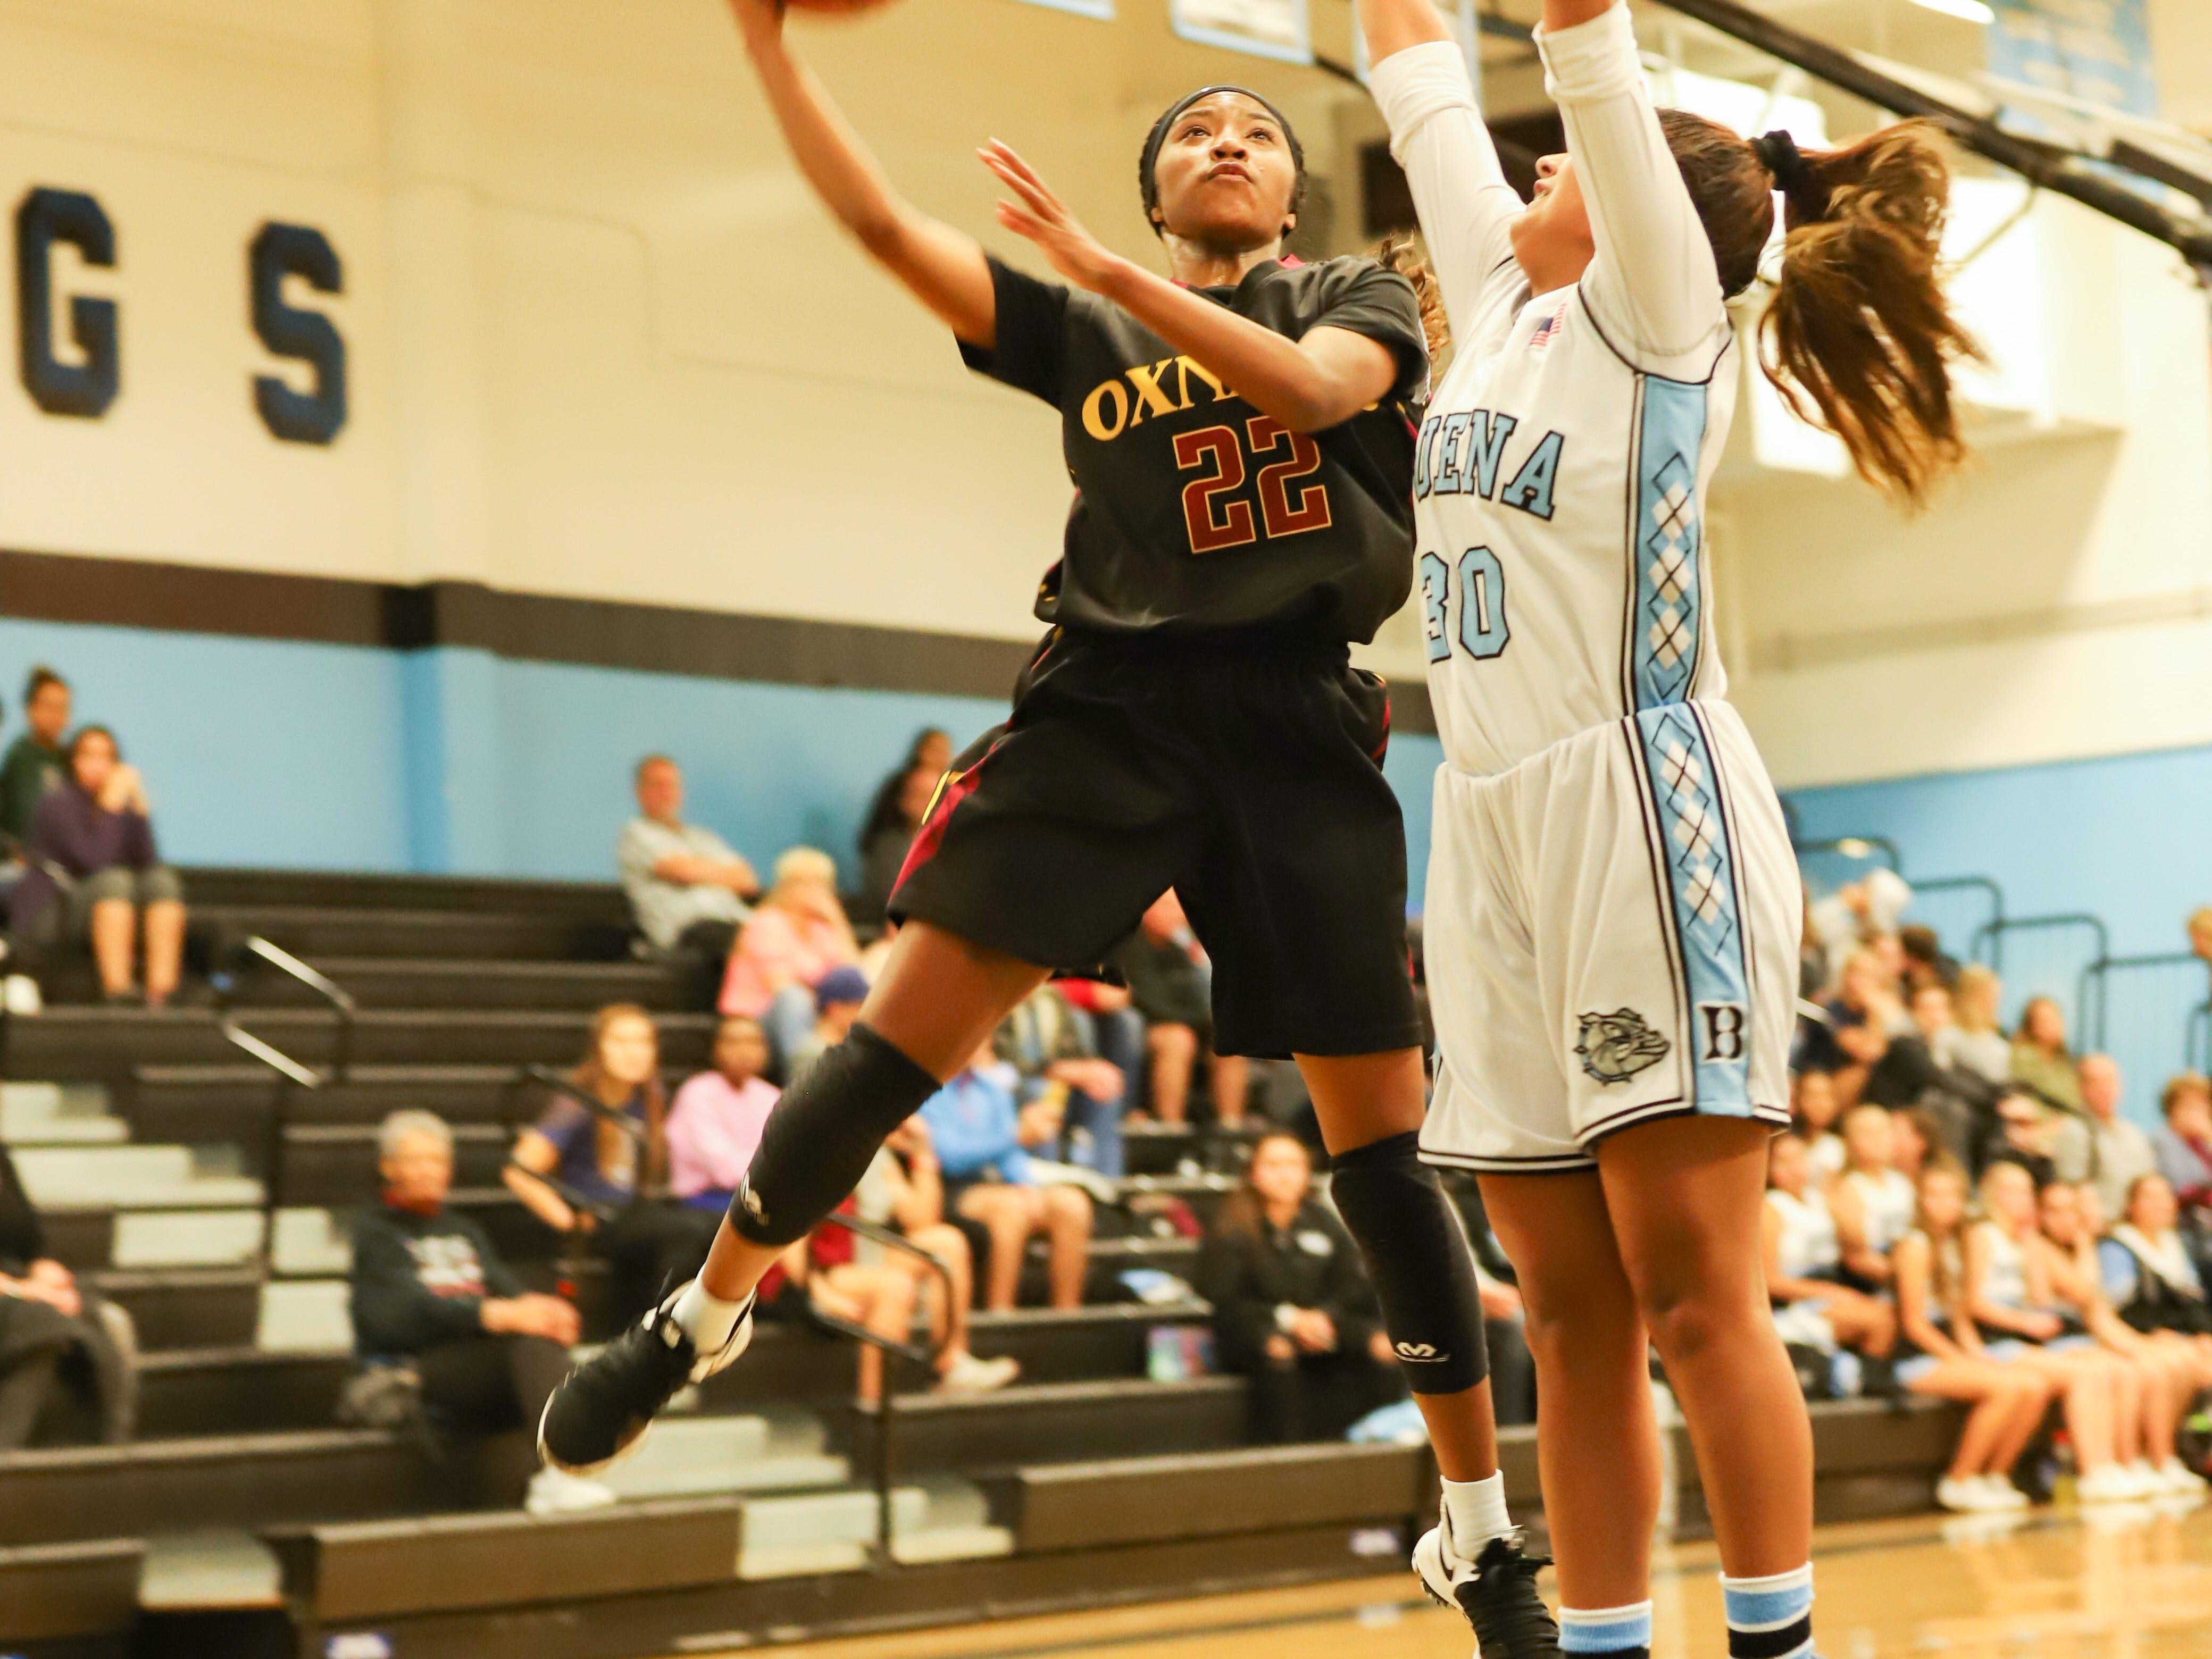 Myesha Lumas, left, is the leading scorer of a well-balanced Oxnard High girls basketball team.